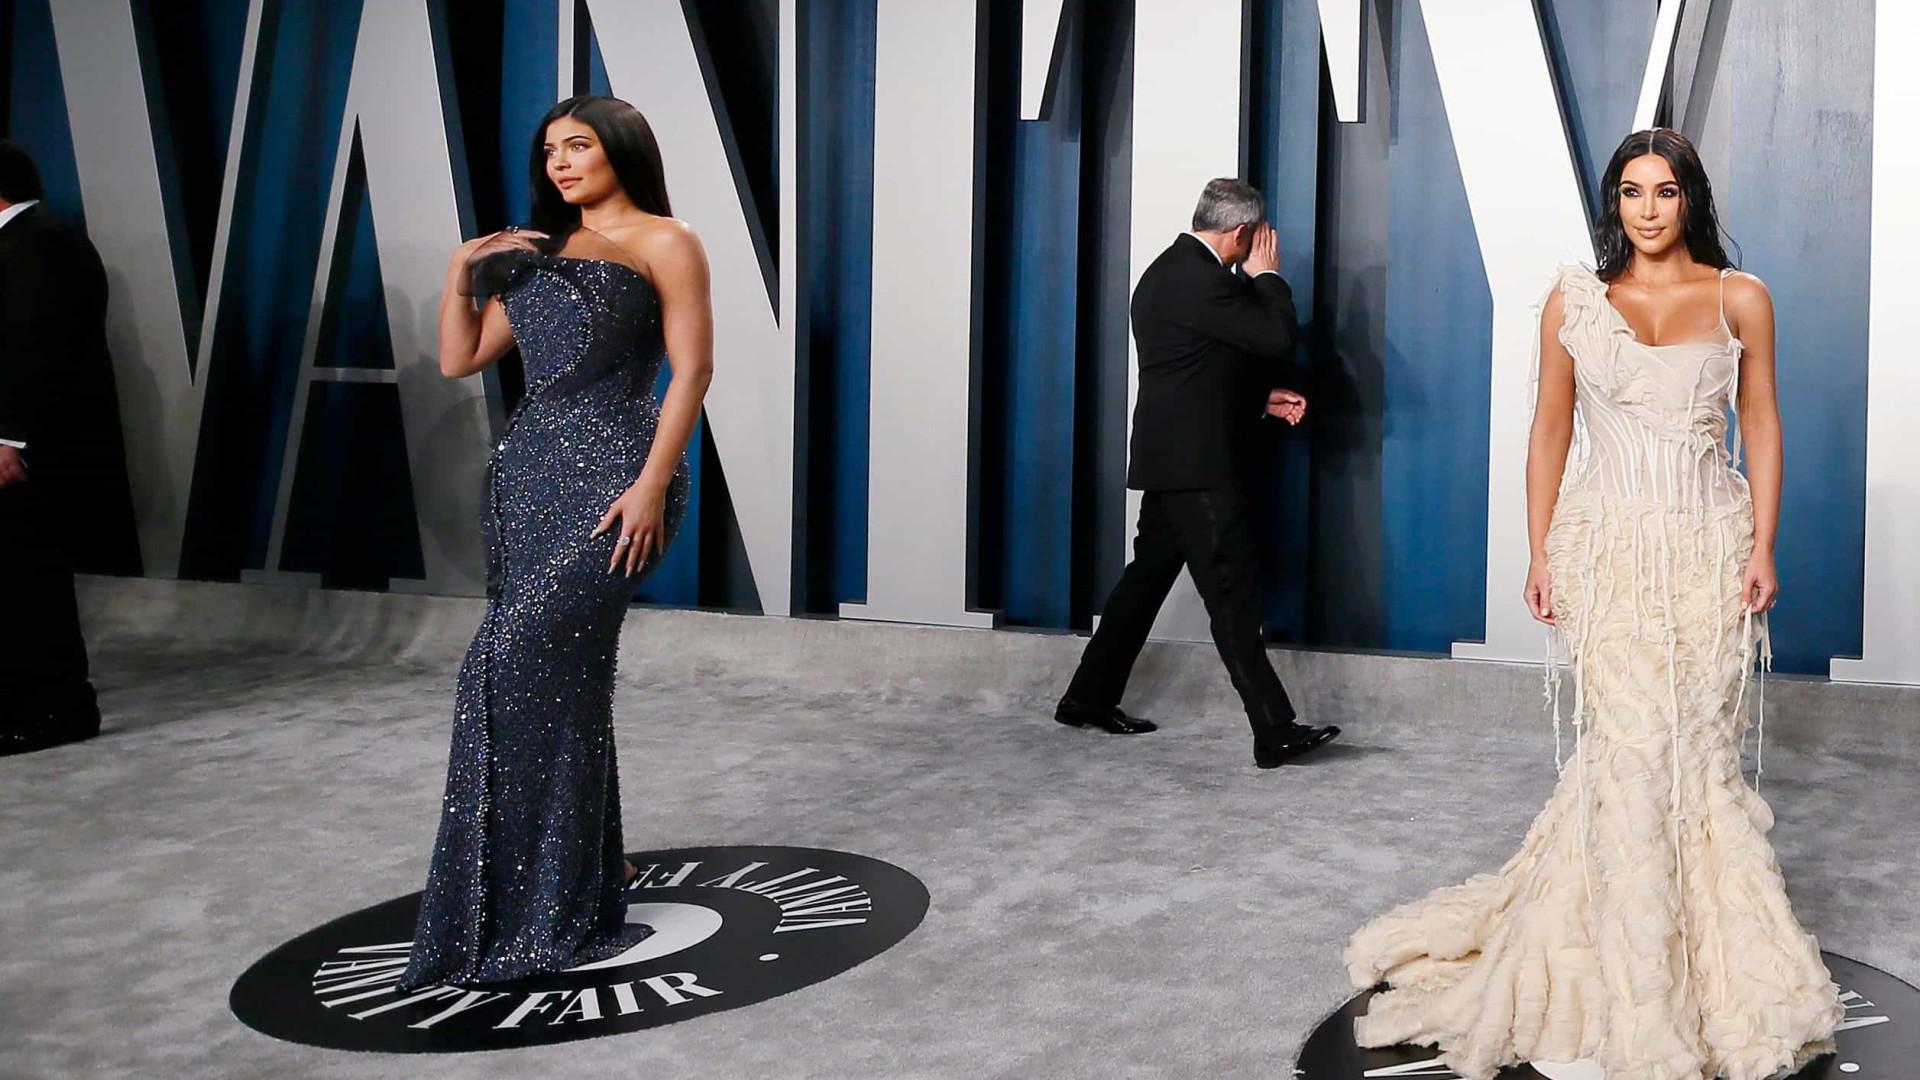 Kardashians recebem iPhones novos toda semana para gravarem reality